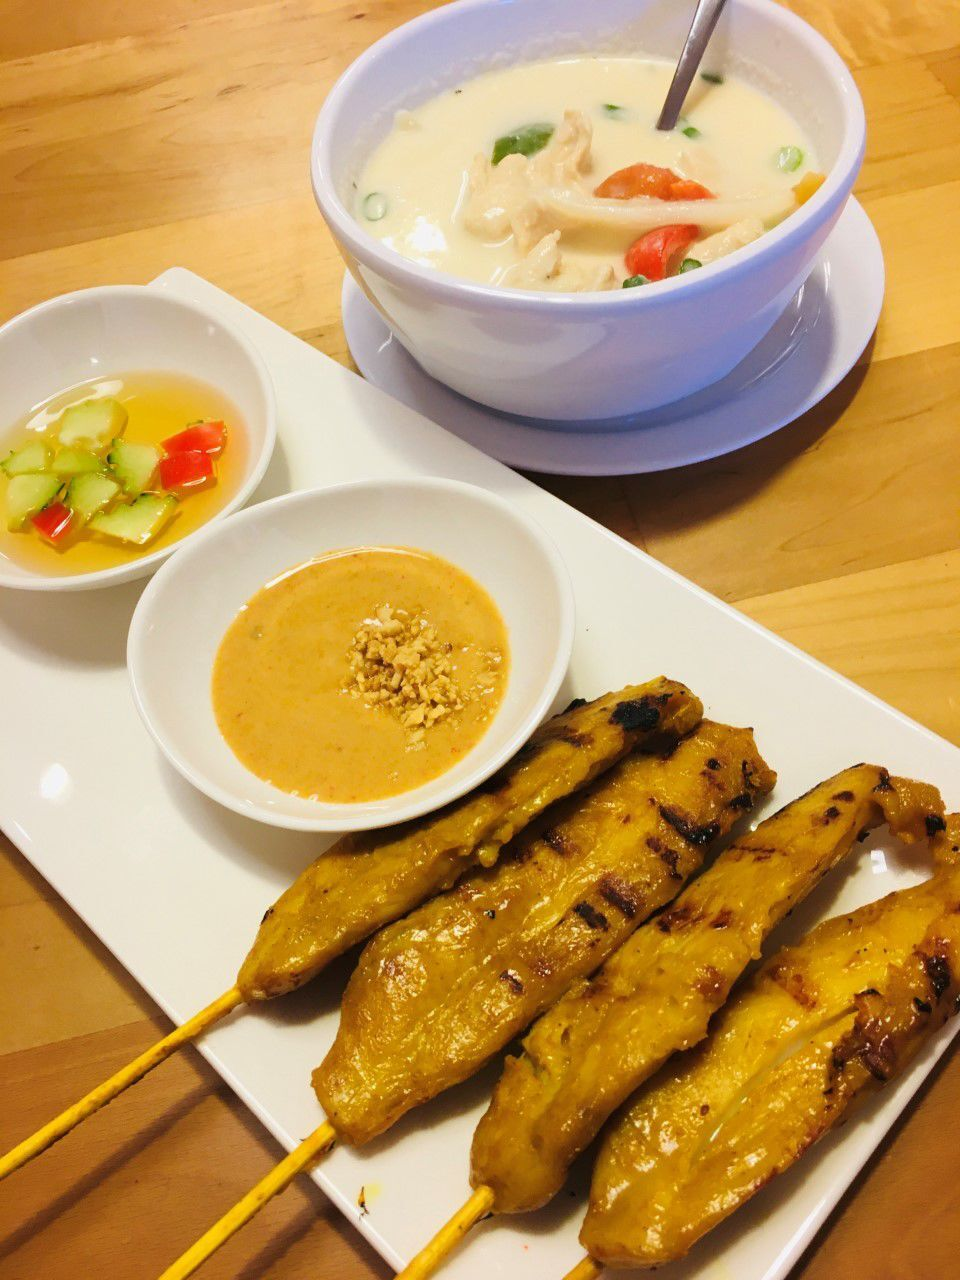 20210324-gm-foodguy_Chicken Satay and Tom Kha Soup.jpg